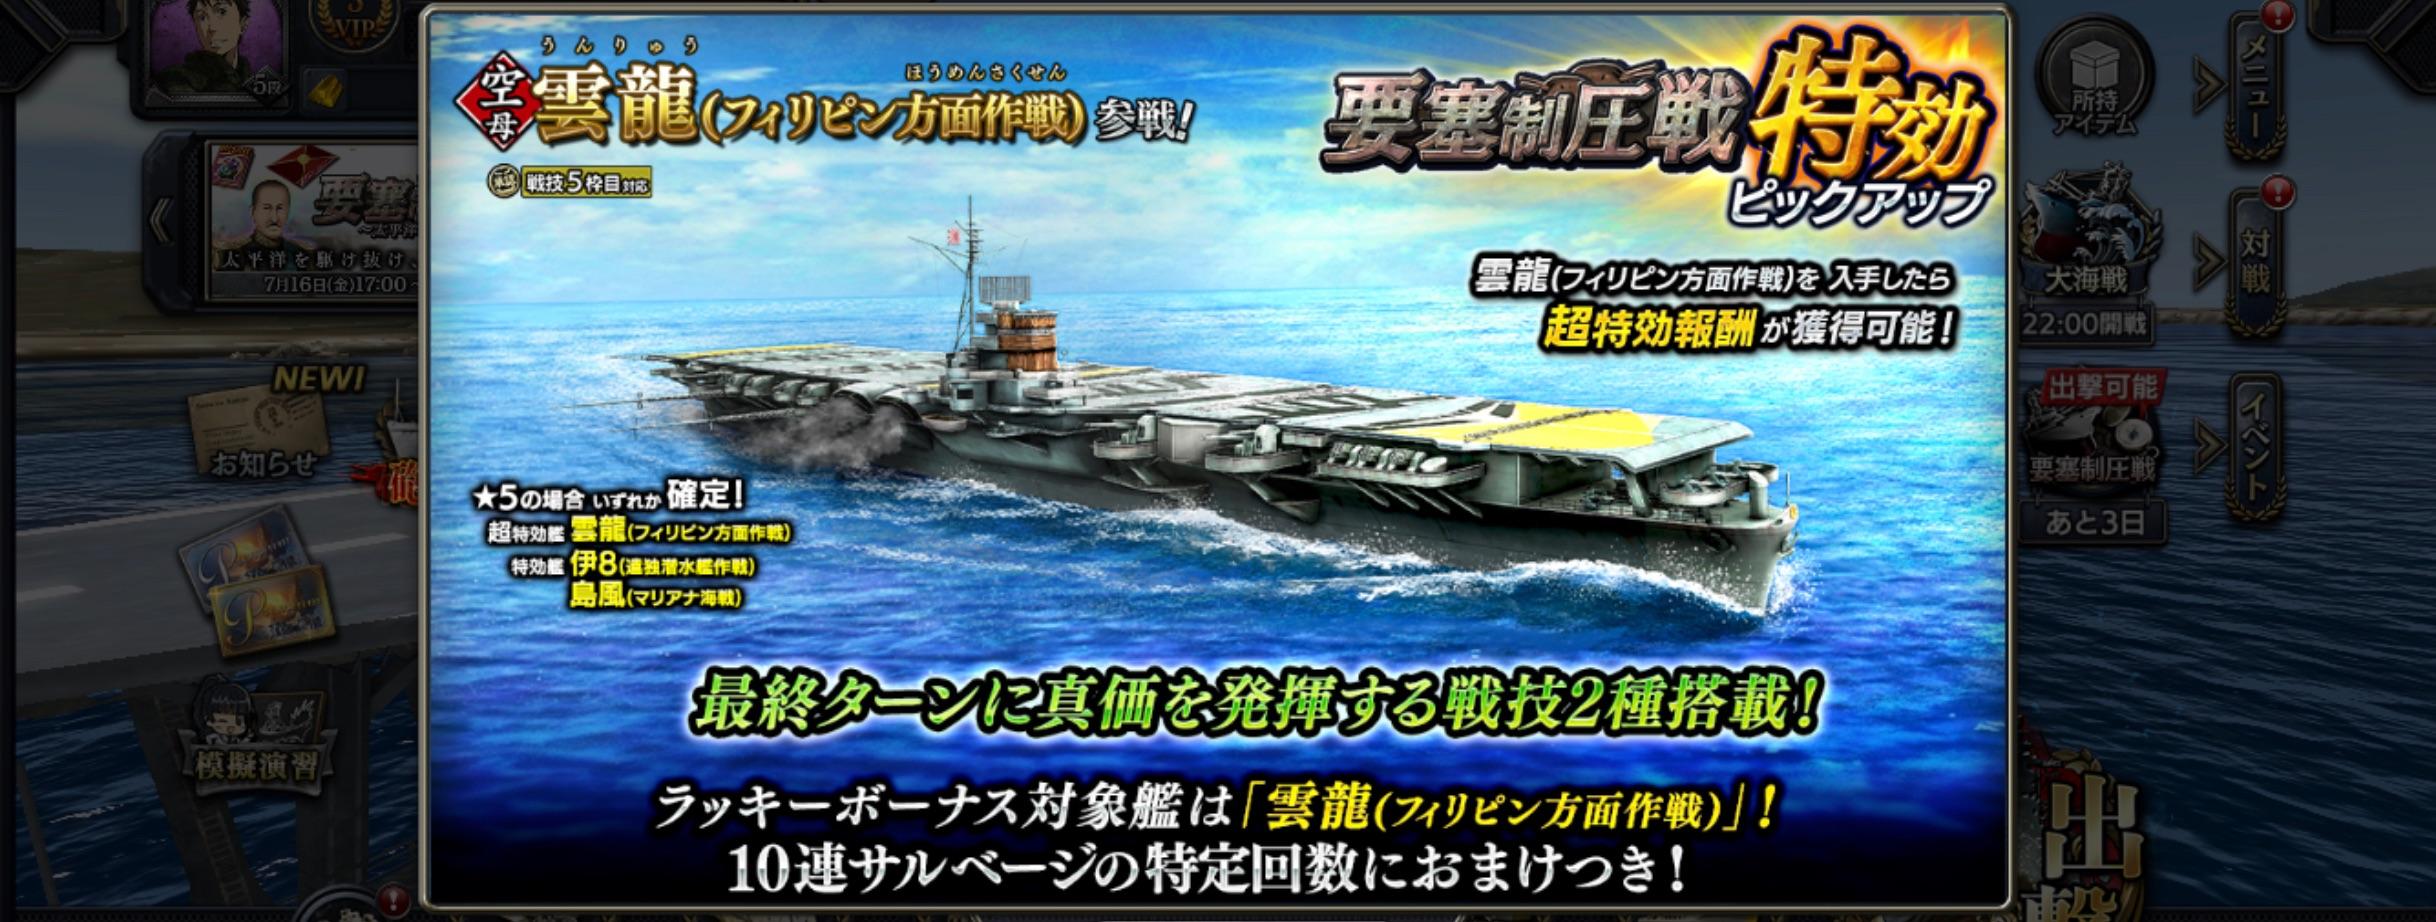 aircraft-carrier:UnryuF